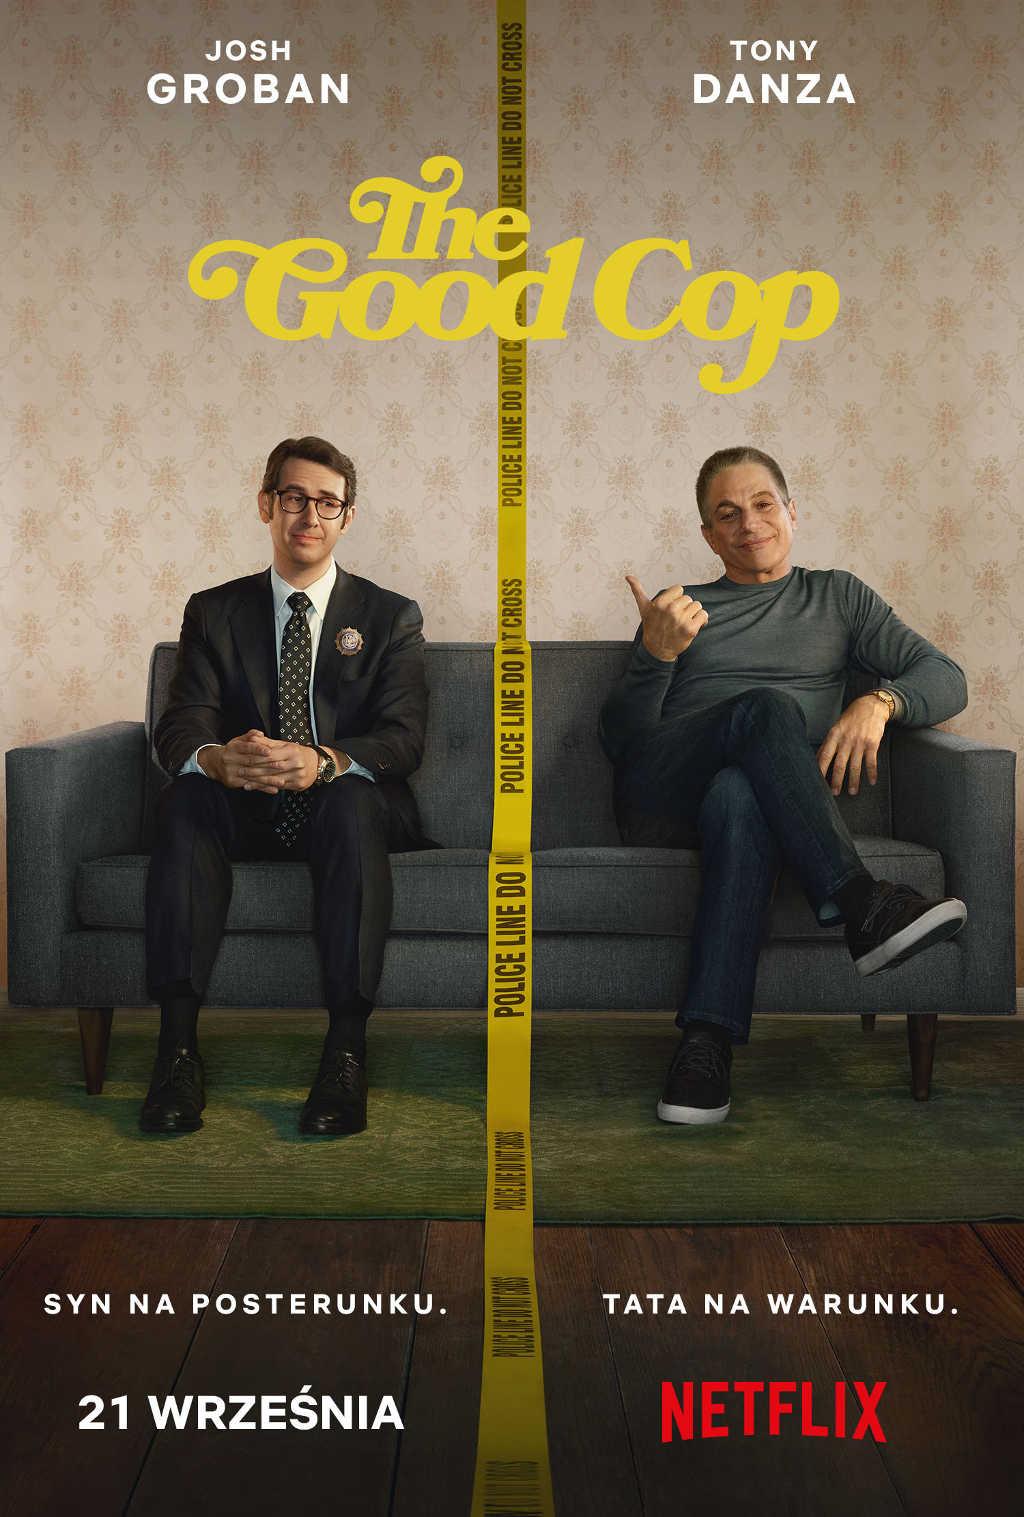 THE_GOOD_COP Poster PL